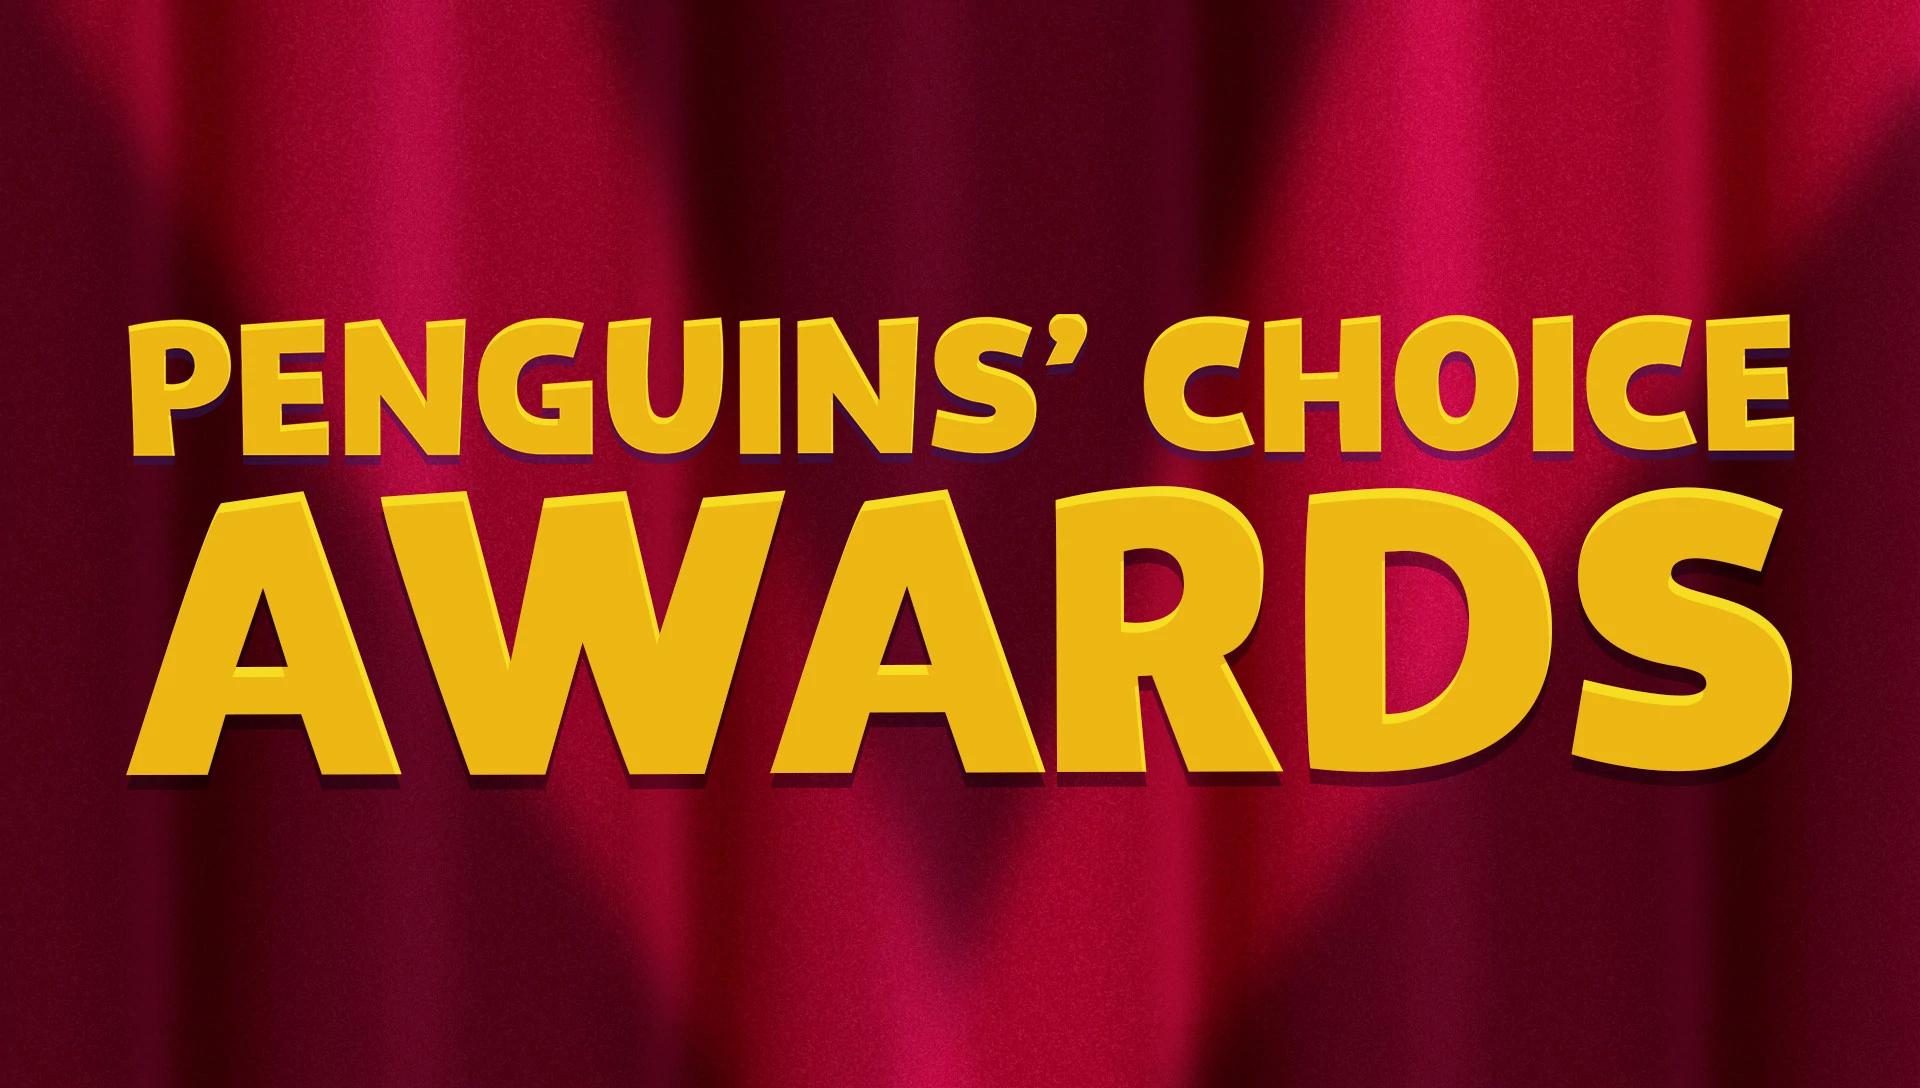 Penguins' Choice Awards